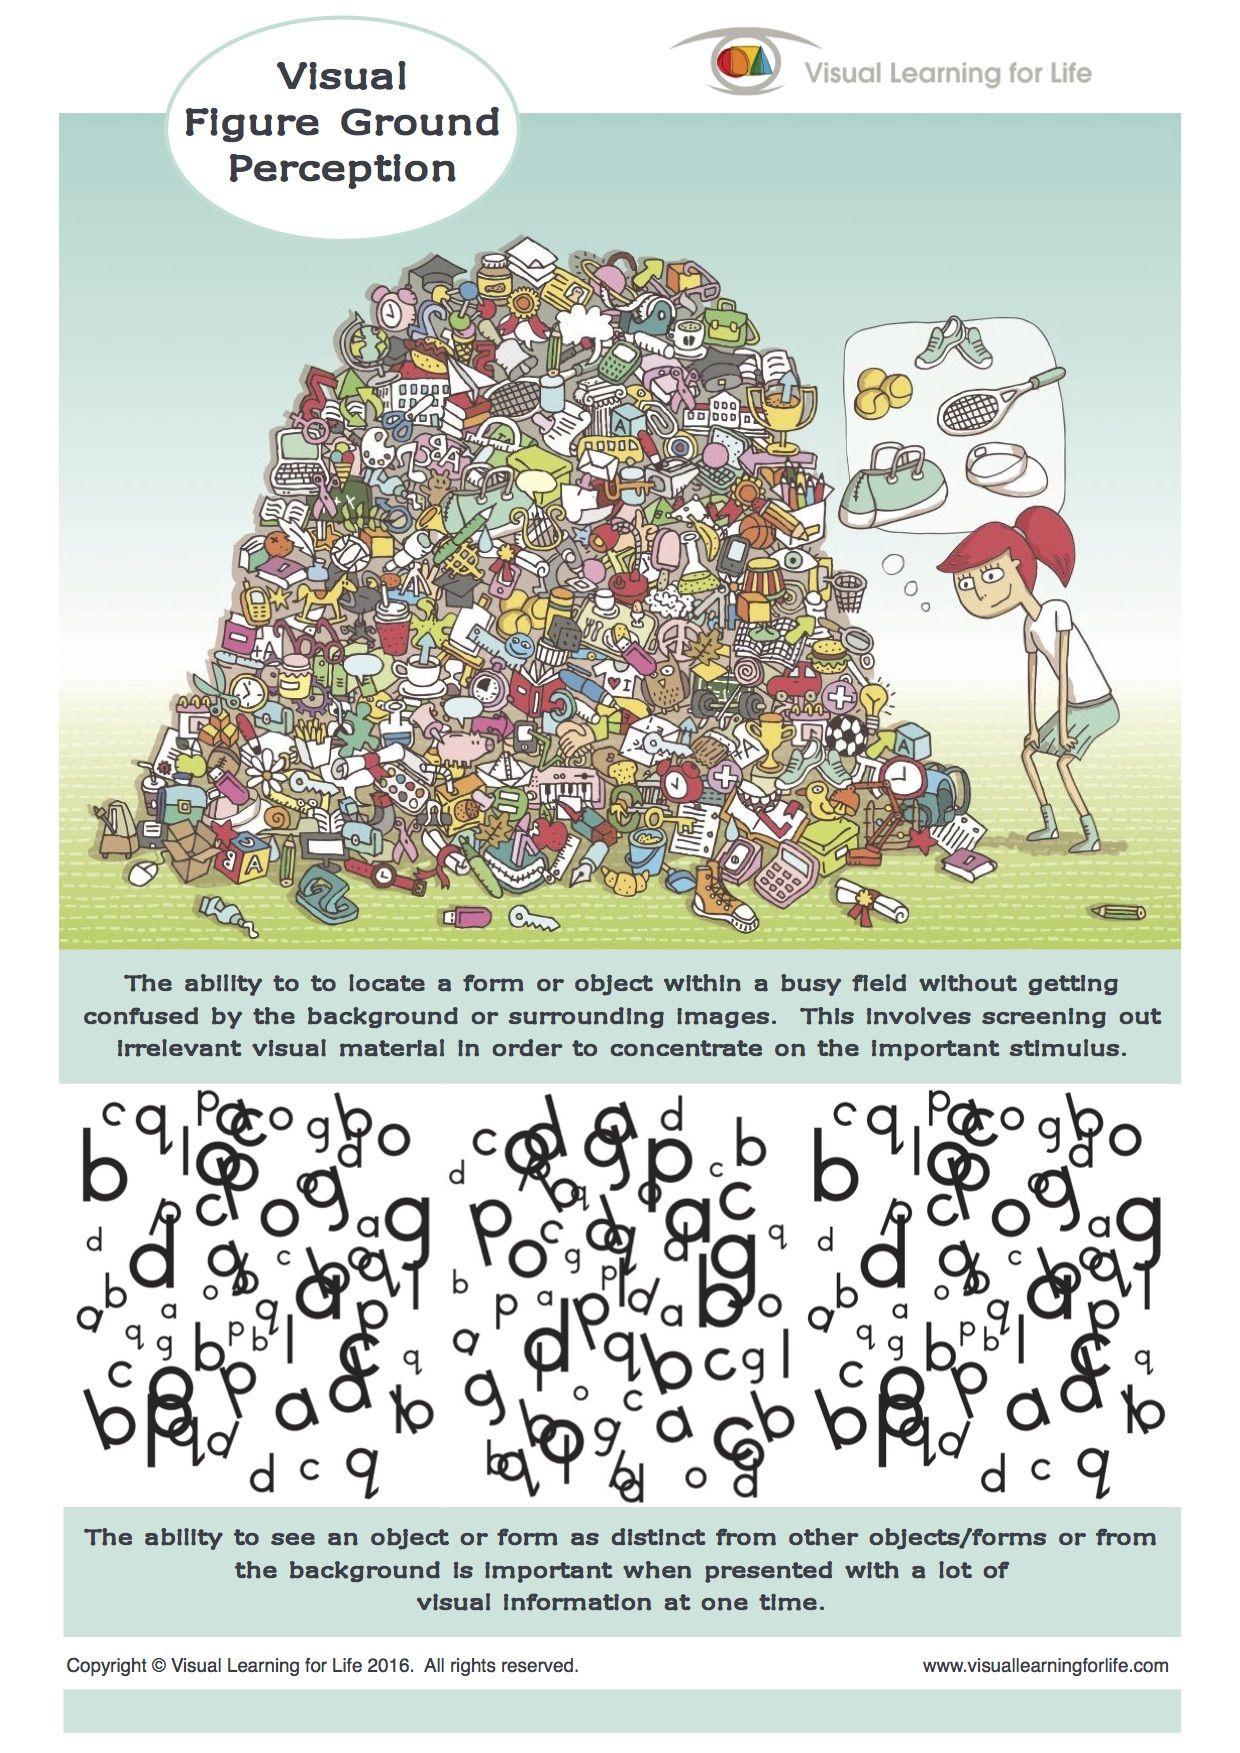 Pin By Silvia Sanchez On Discrimination Visuelle Figure Ground Perception Visual Perception Activities Visual Perception [ 1753 x 1240 Pixel ]